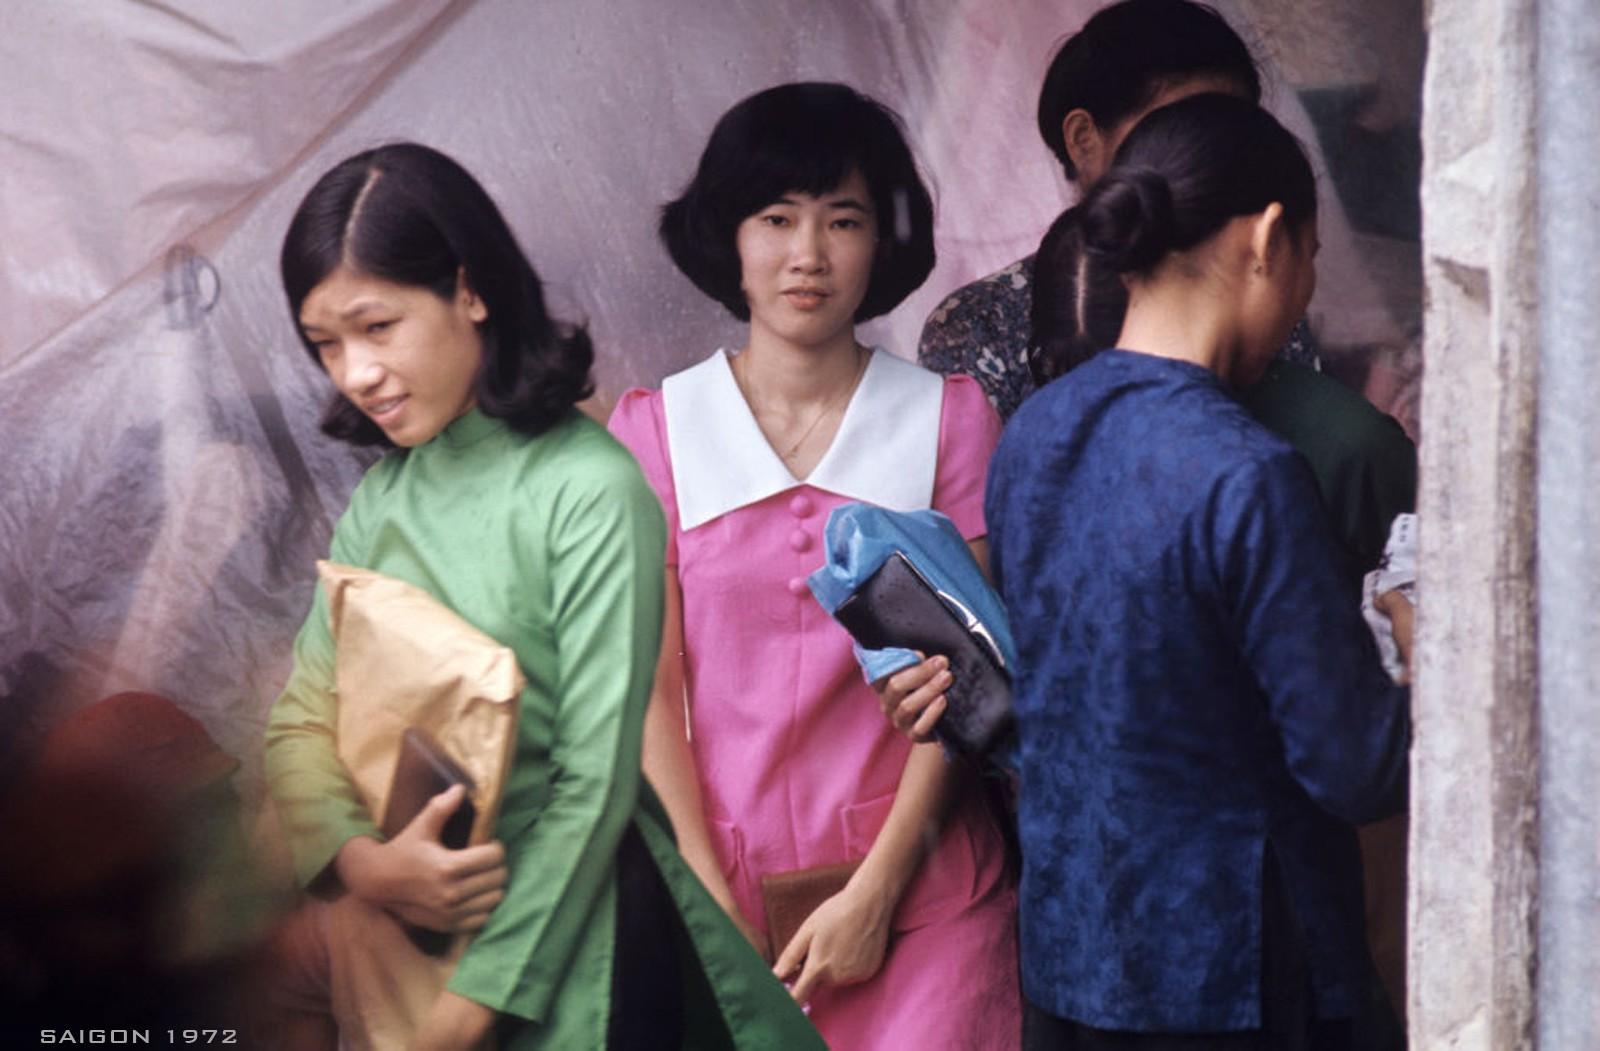 interesting photos of saigon women in 1972 under us photographers lens